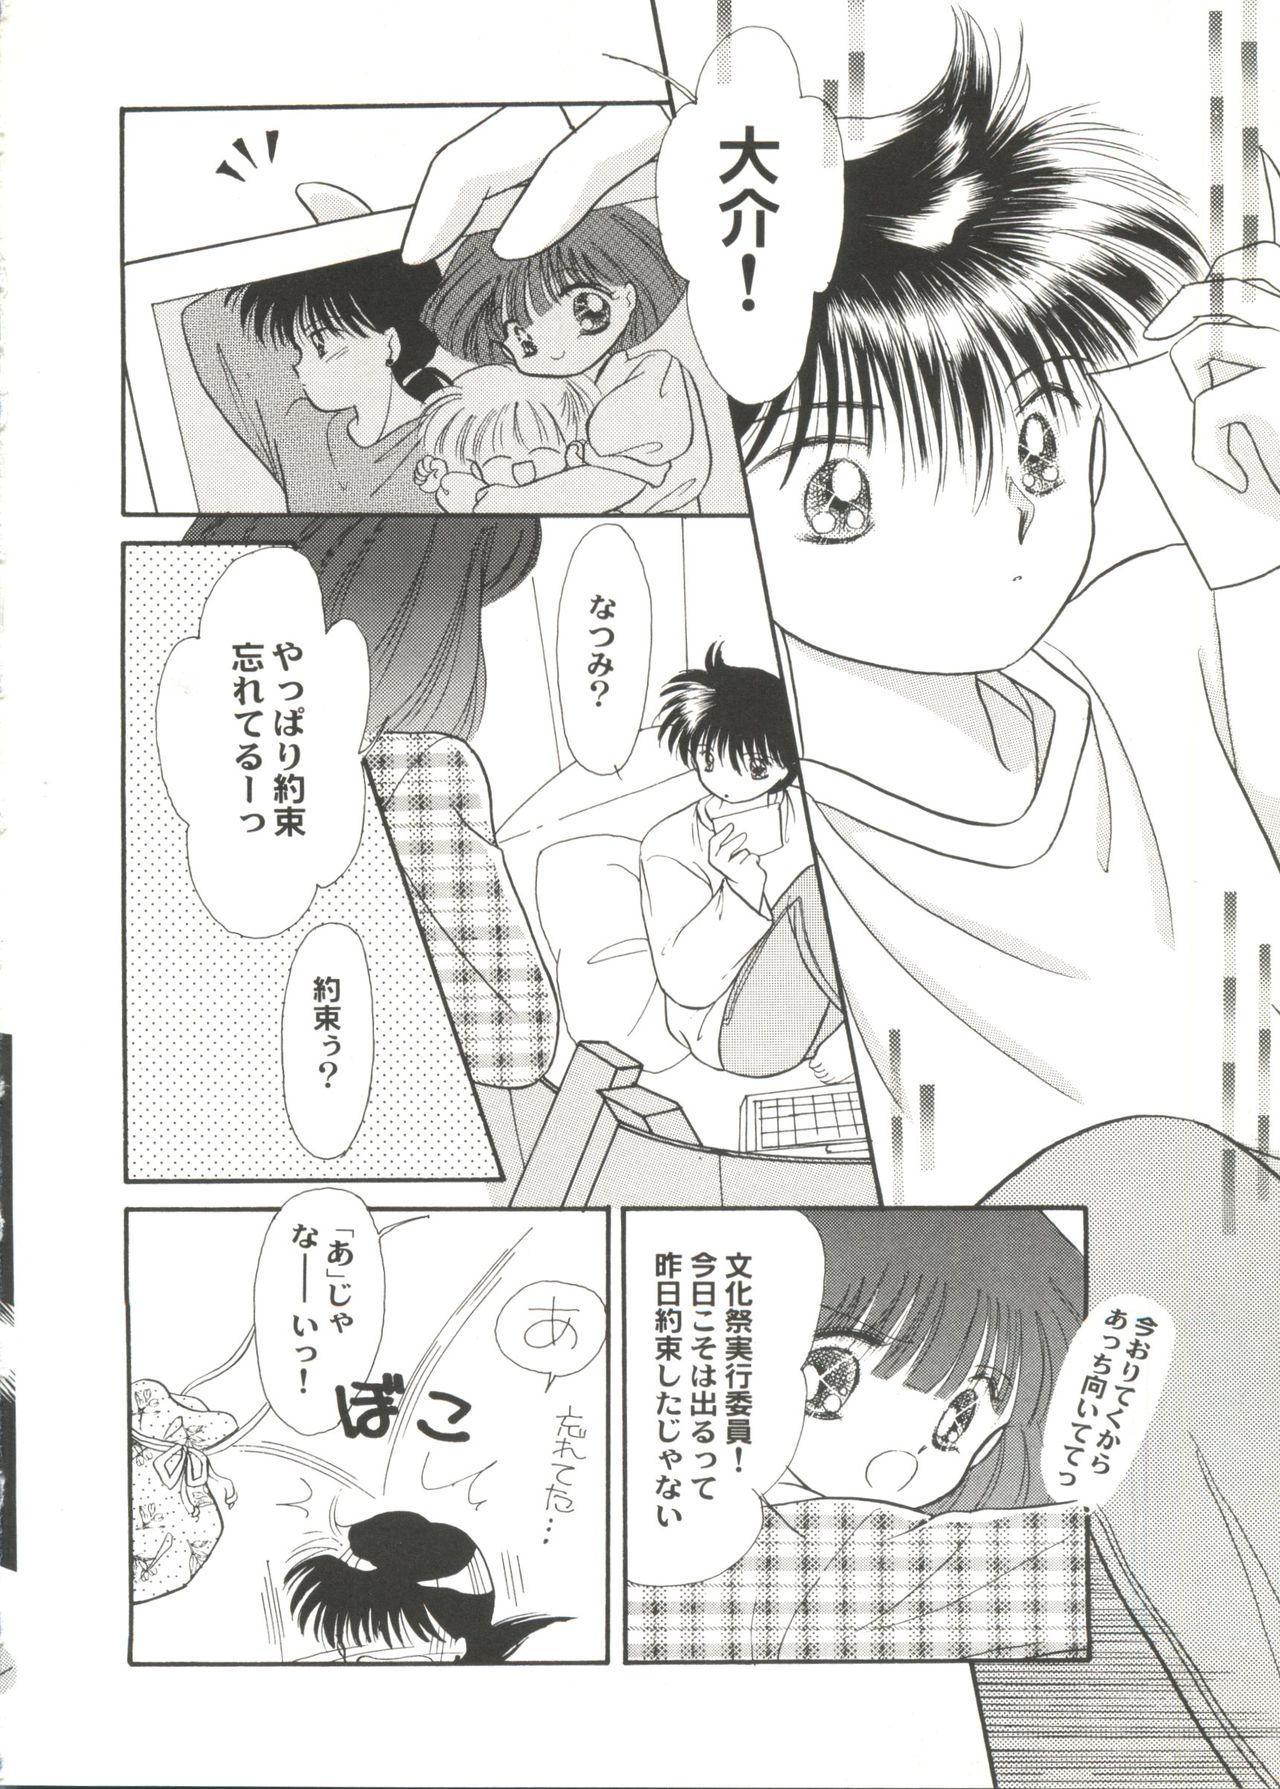 Bishoujo Doujin Peach Club - Pretty Gal's Fanzine Peach Club 9 85